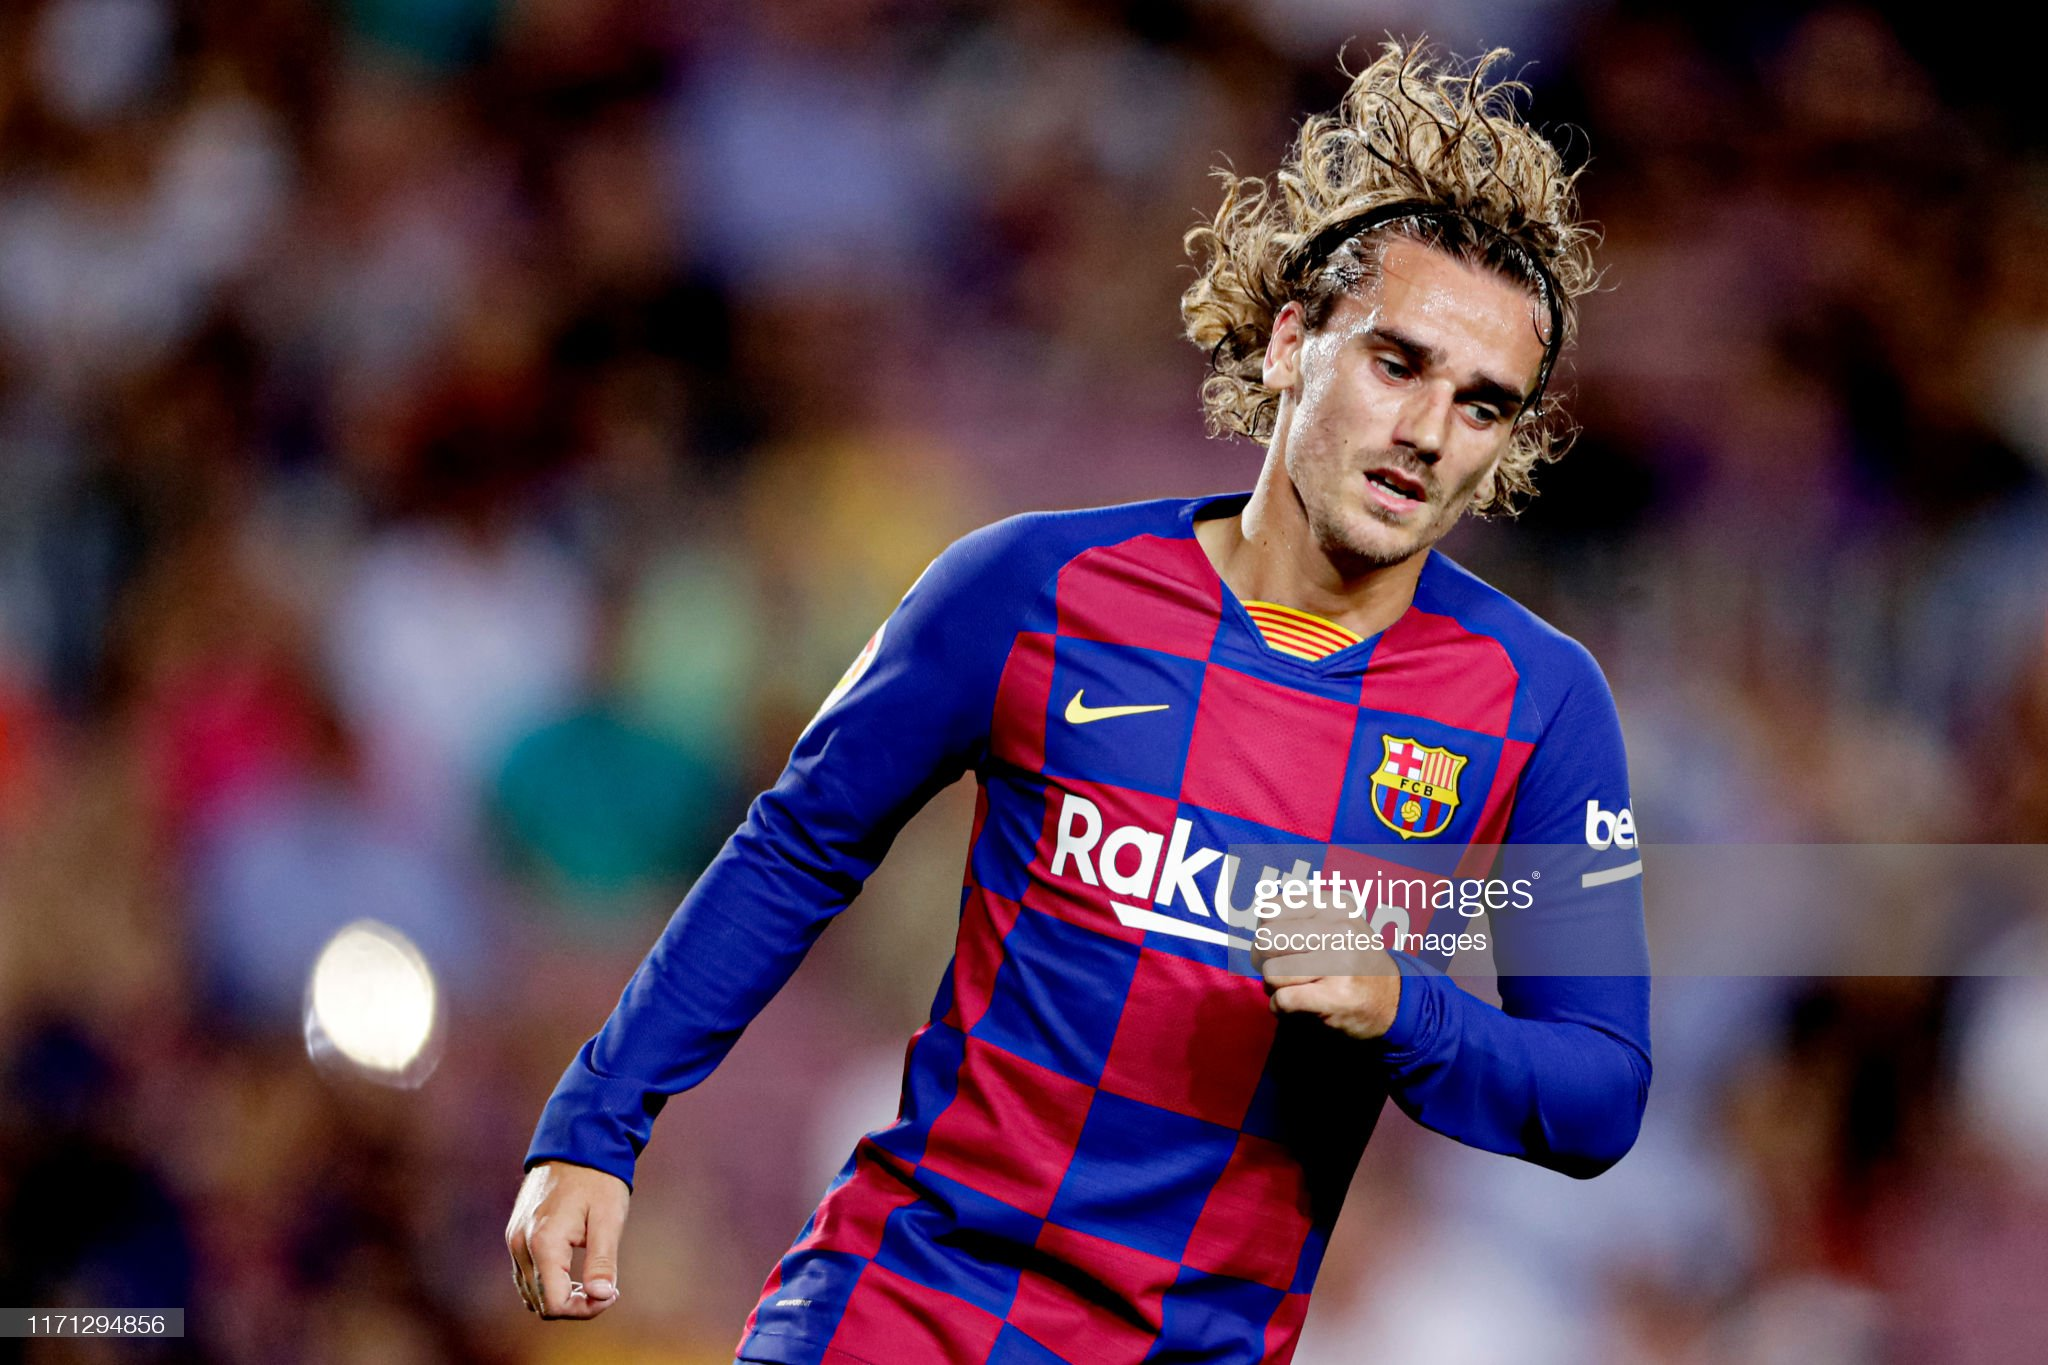 صور مباراة : برشلونة - فياريال 2-1 ( 24-09-2019 )  Antoine-griezmann-of-fc-barcelona-during-the-la-liga-santander-match-picture-id1171294856?s=2048x2048